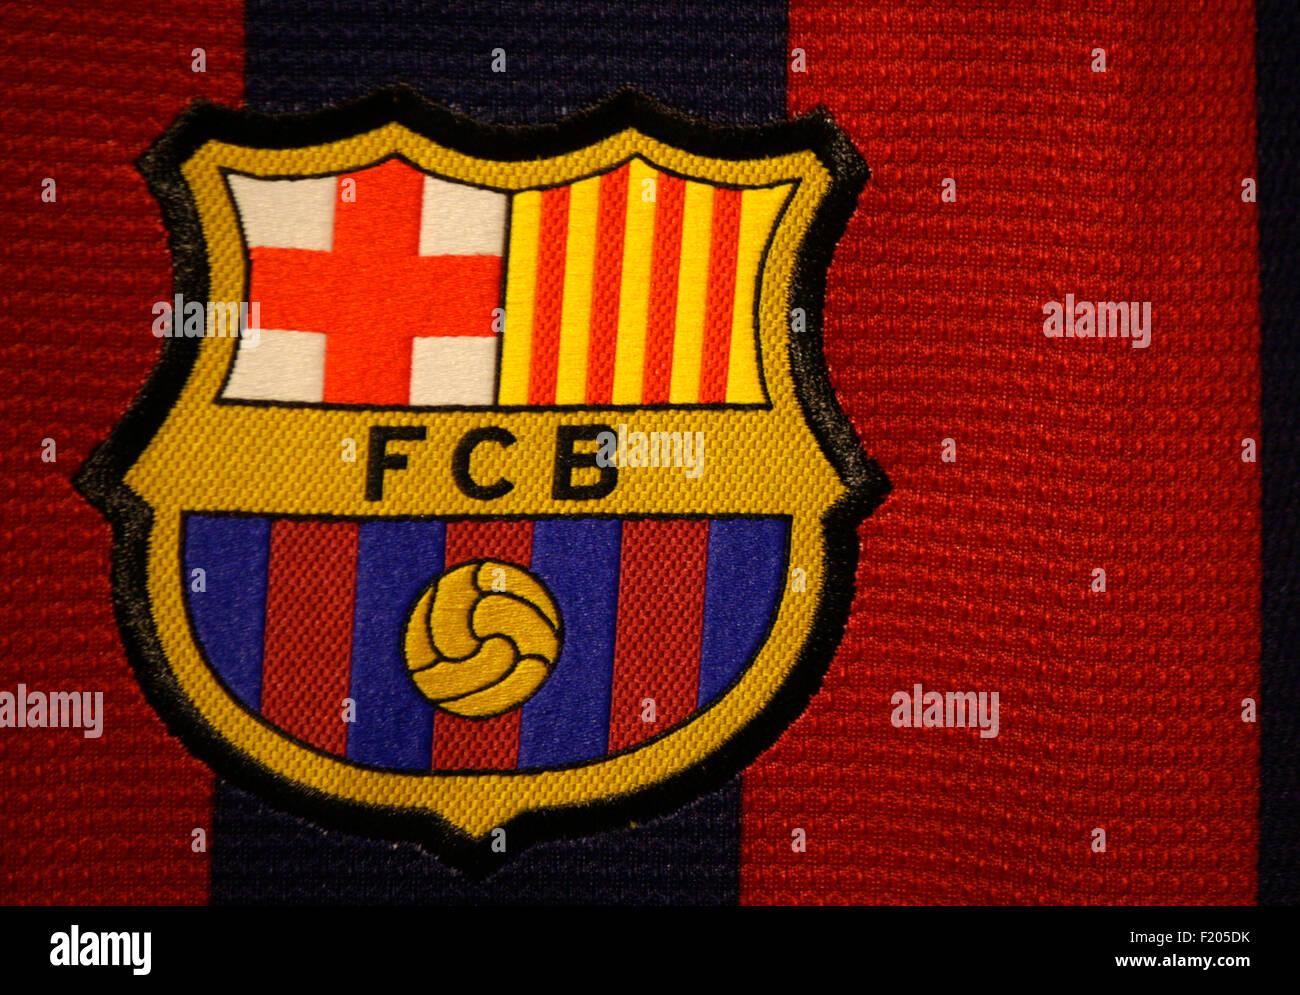 Markenname: 'FC Barcelona', Berlin. - Stock Image